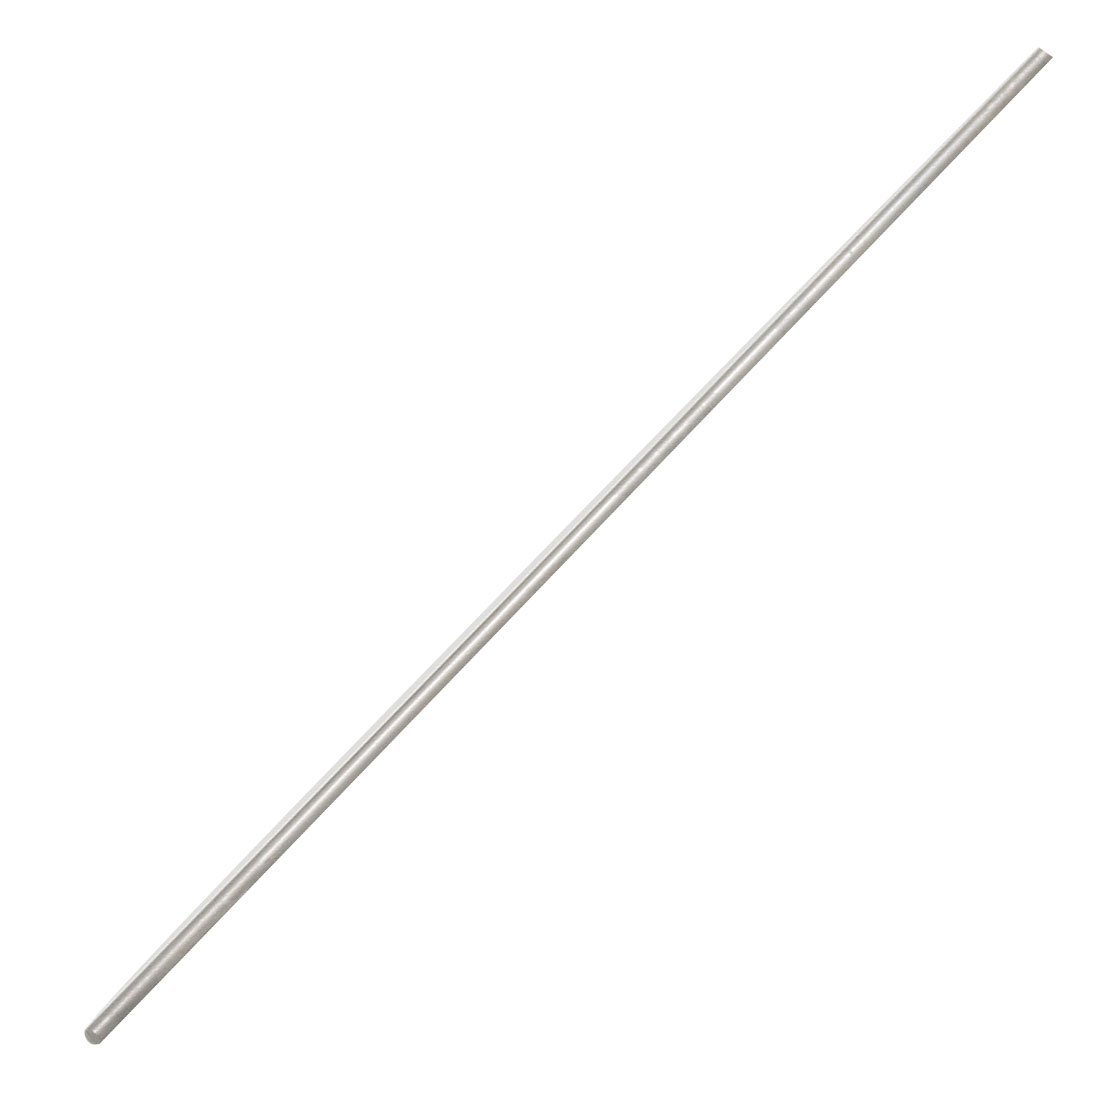 0.6mm Diameter Tungsten Carbide Plug Pin Gage Gauge w Storage Box Sourcingmap a12041000ux0384